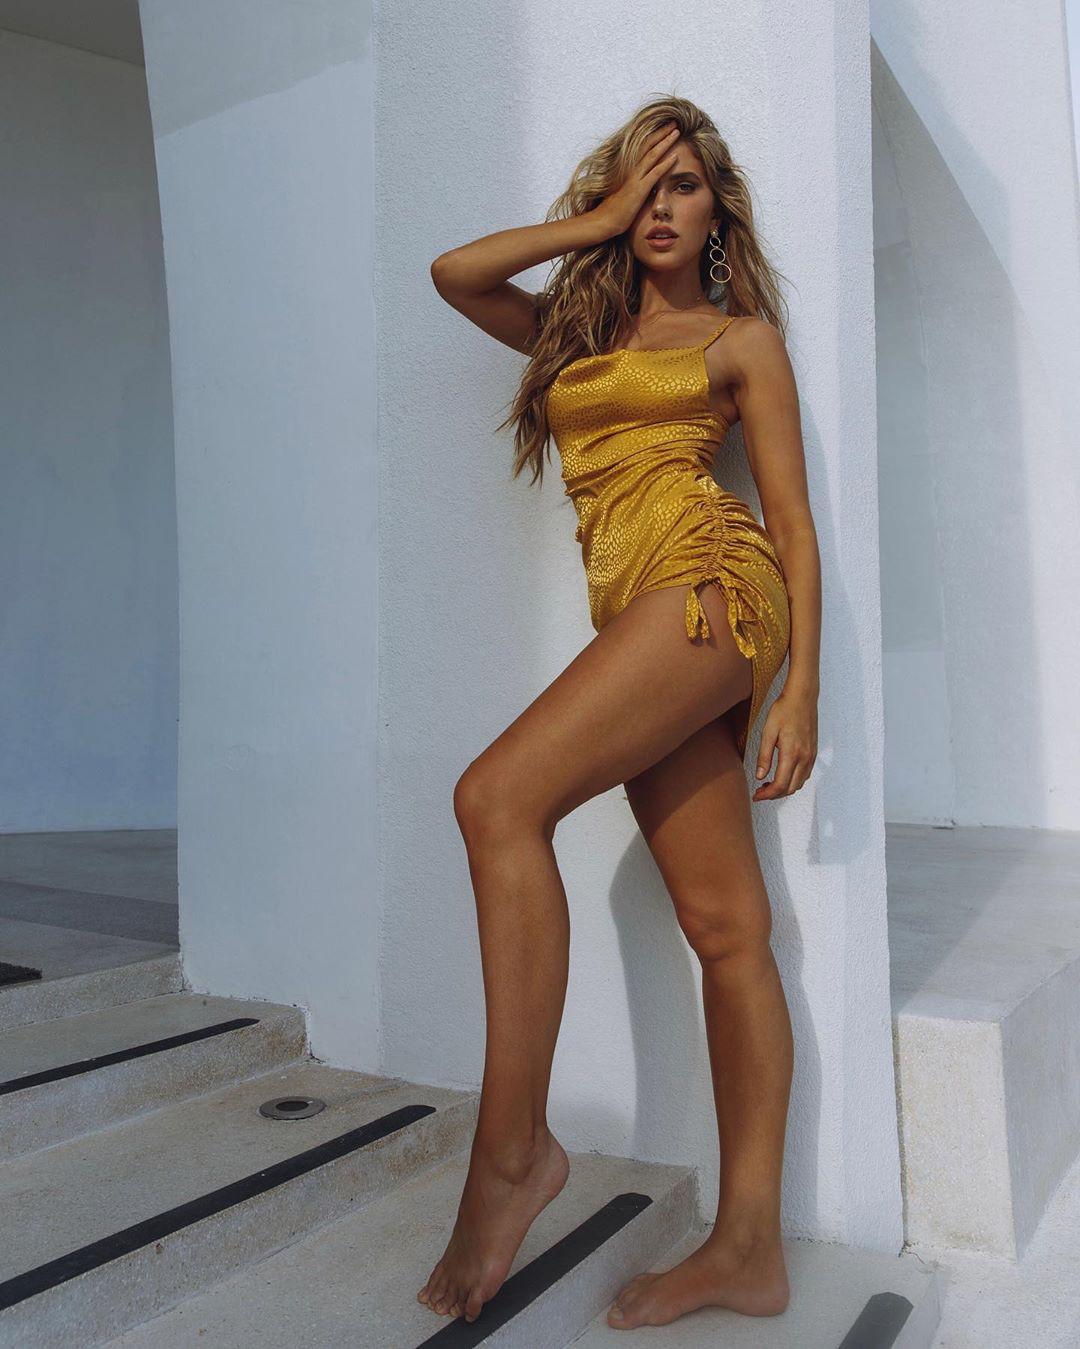 Kara Del Toro hot girls thighs, sexy legs, blond hairstyle